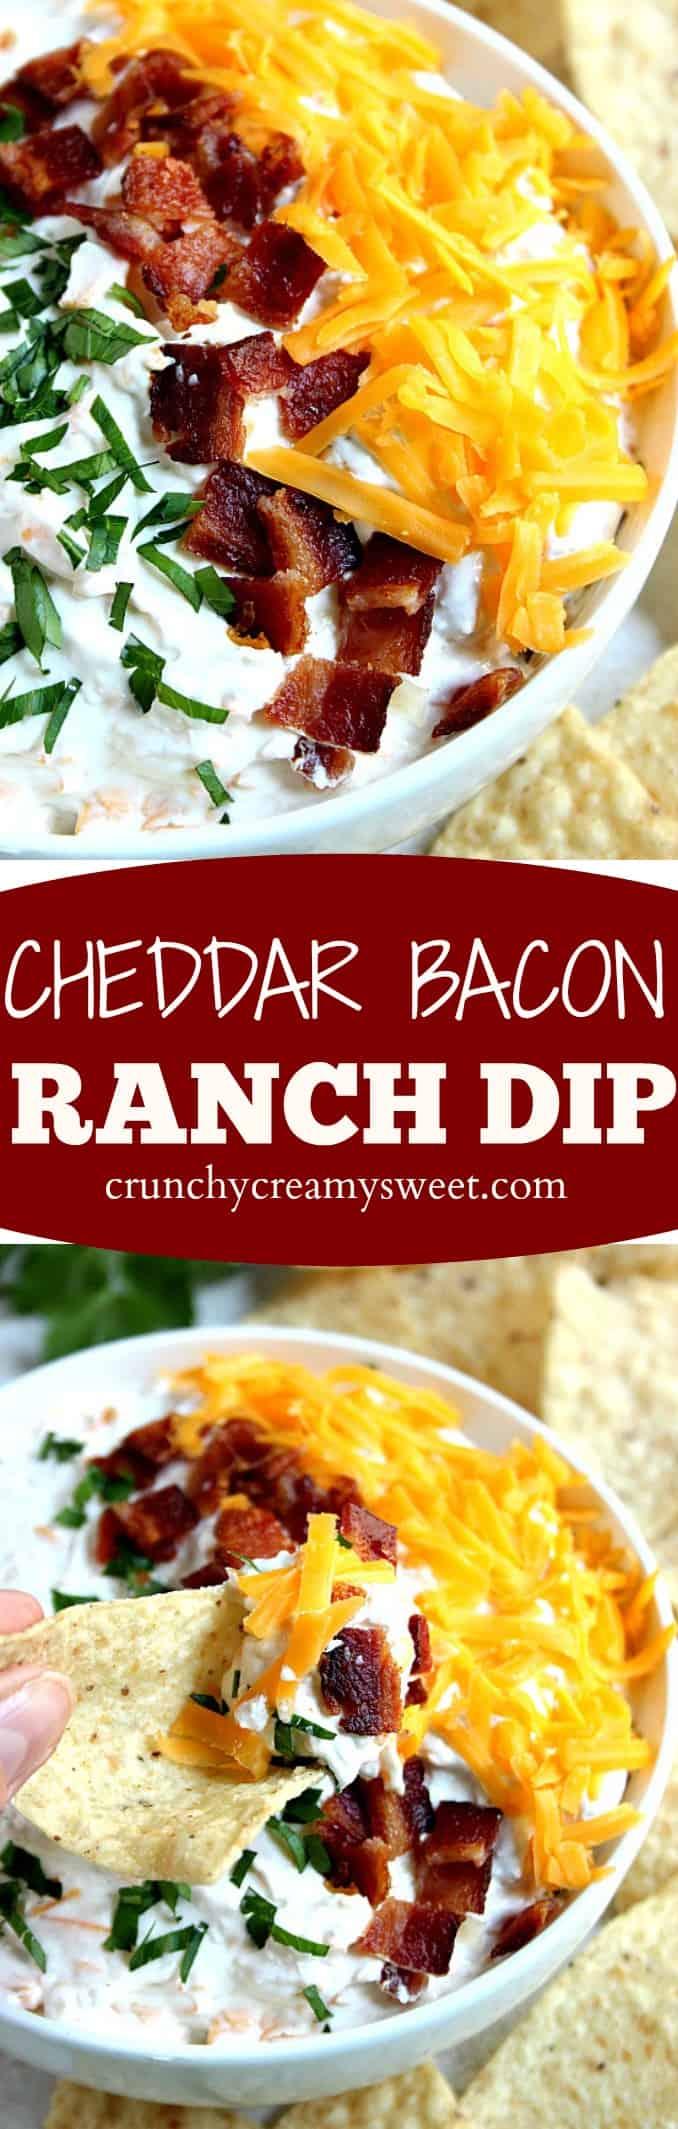 cheddar bacon ranch dip long Cheddar Bacon Ranch Dip